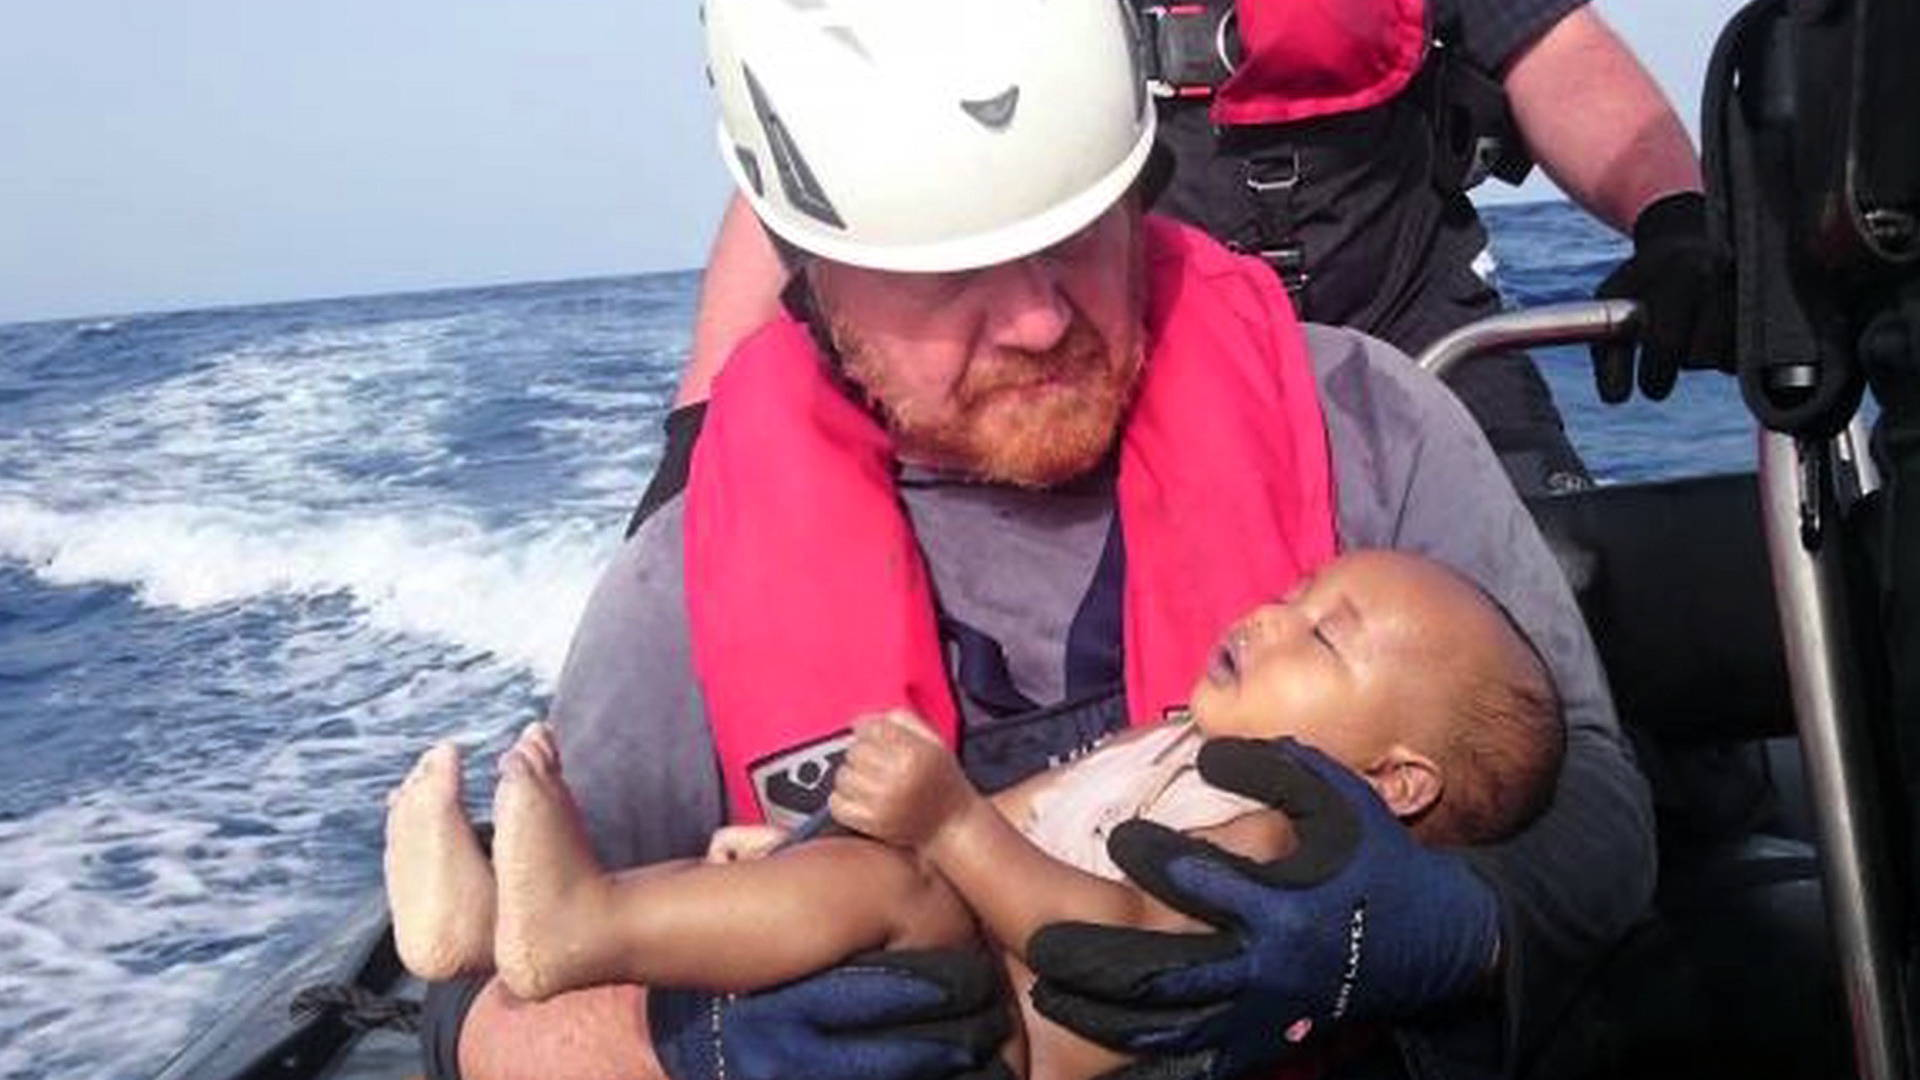 As 1,000 Refugees Drown Under European Policies, Meet the